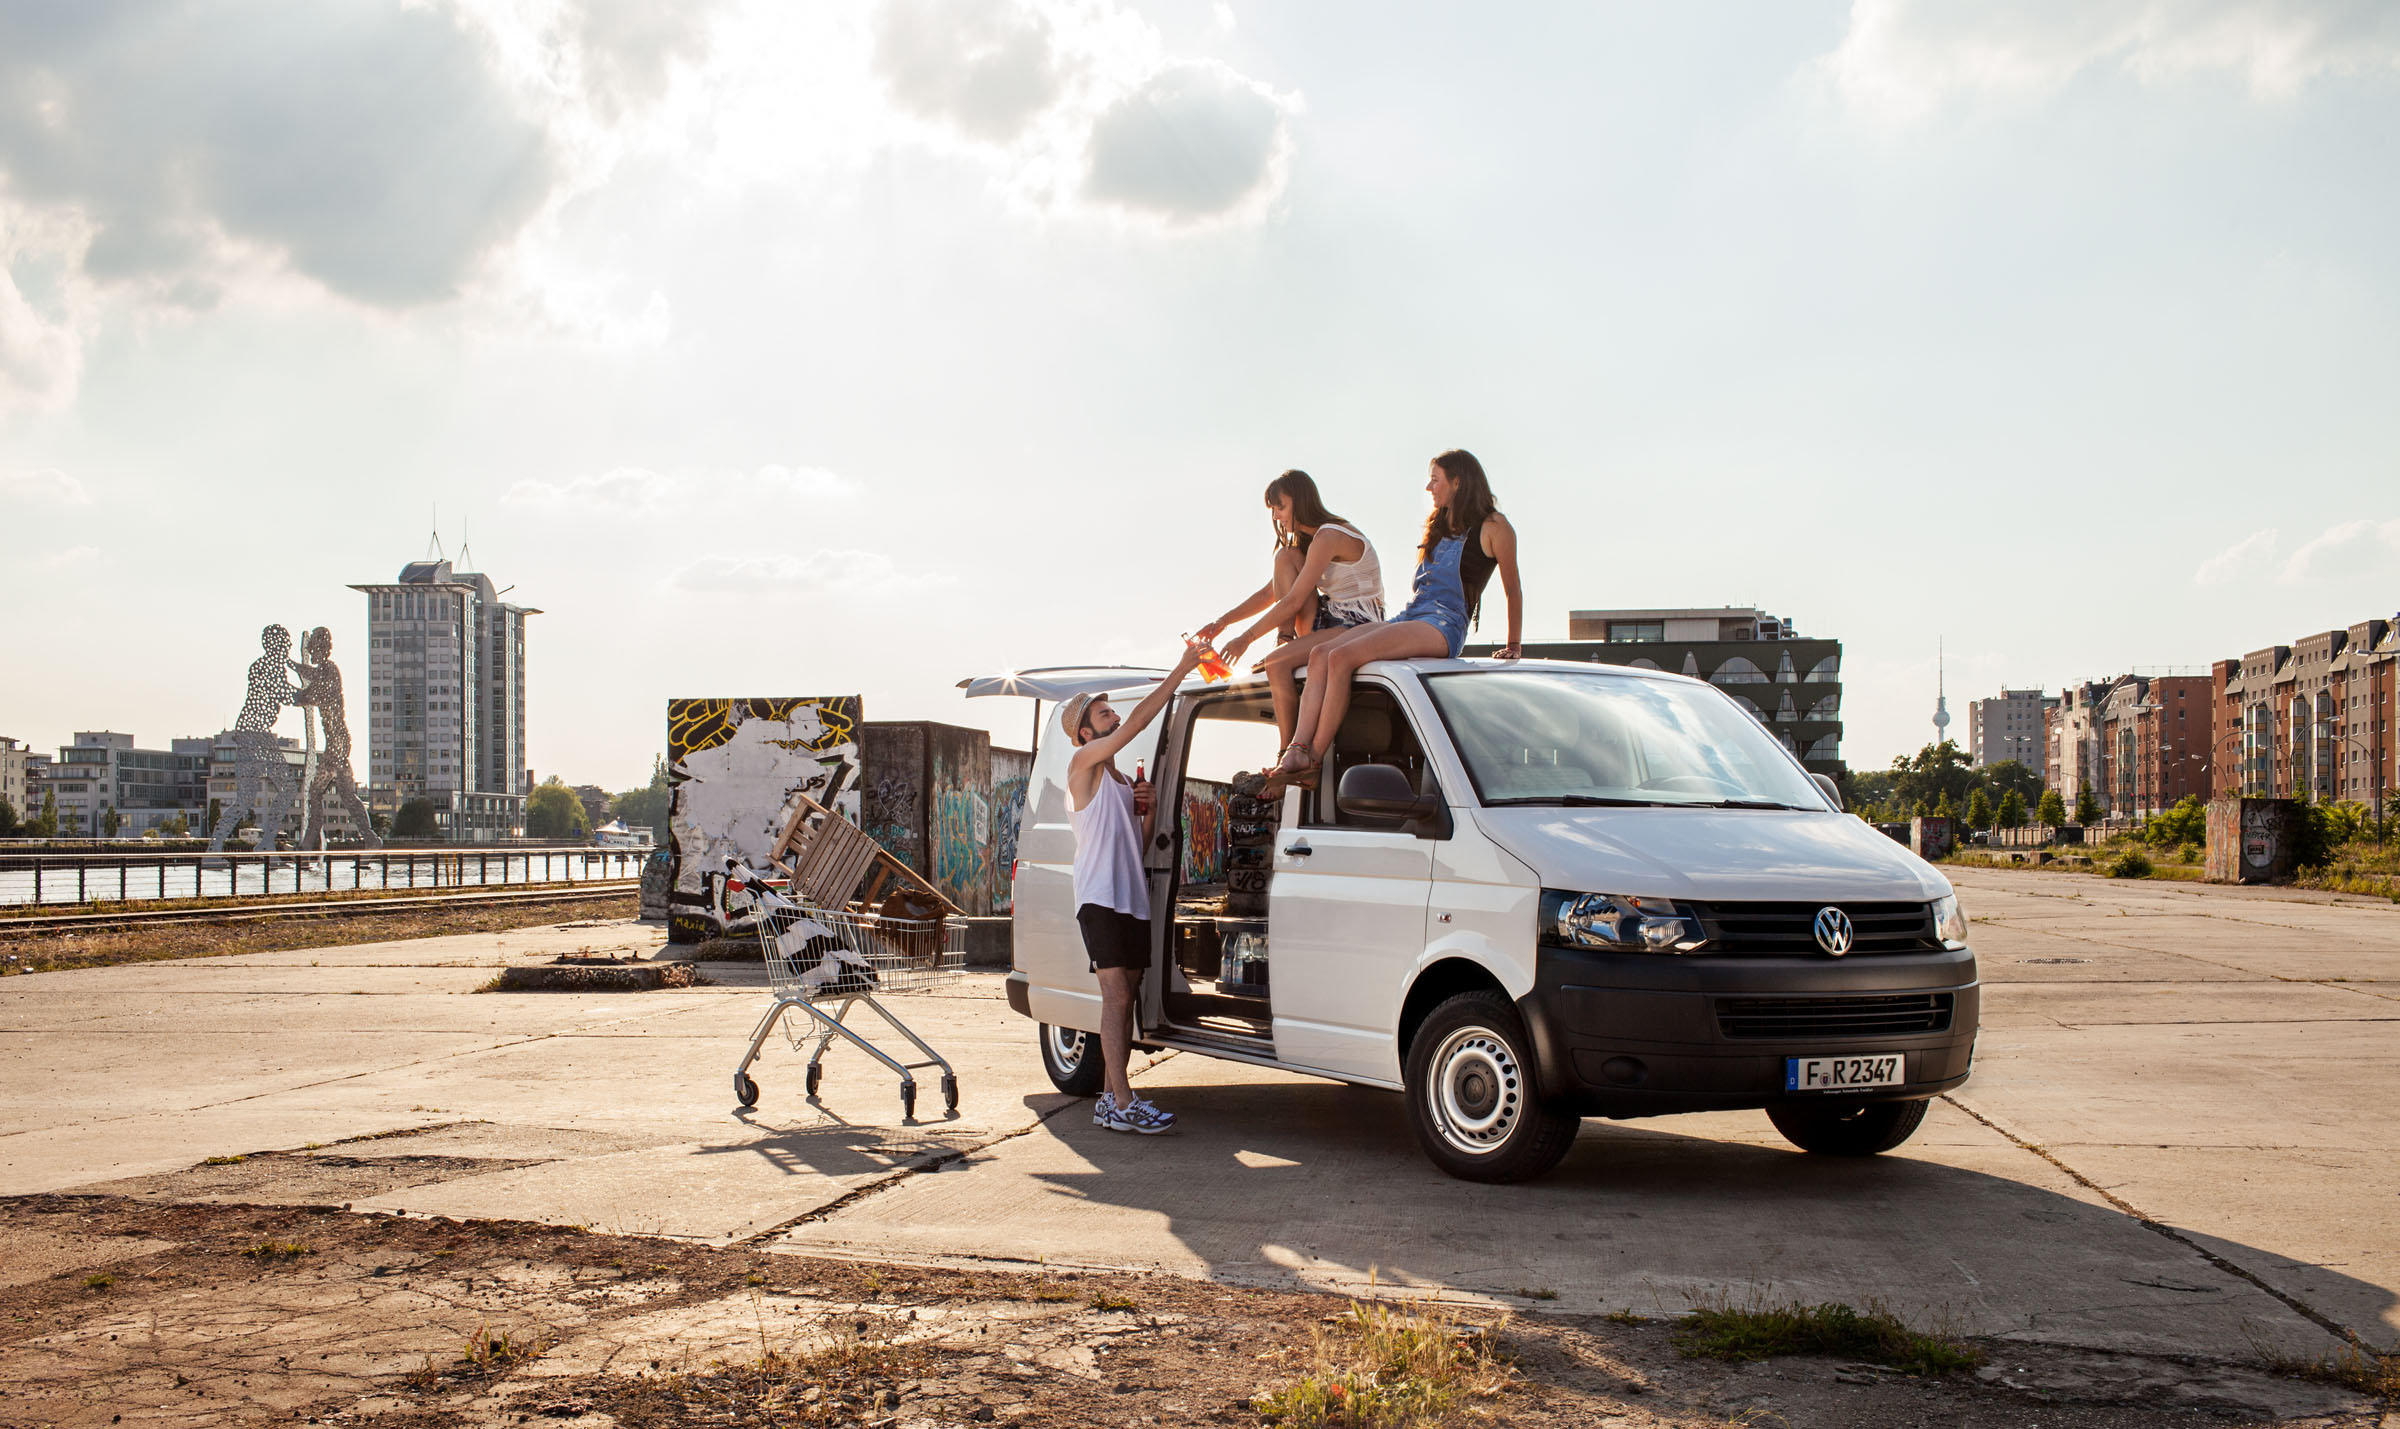 VW-T5-Friends | Markus Esser - Photography